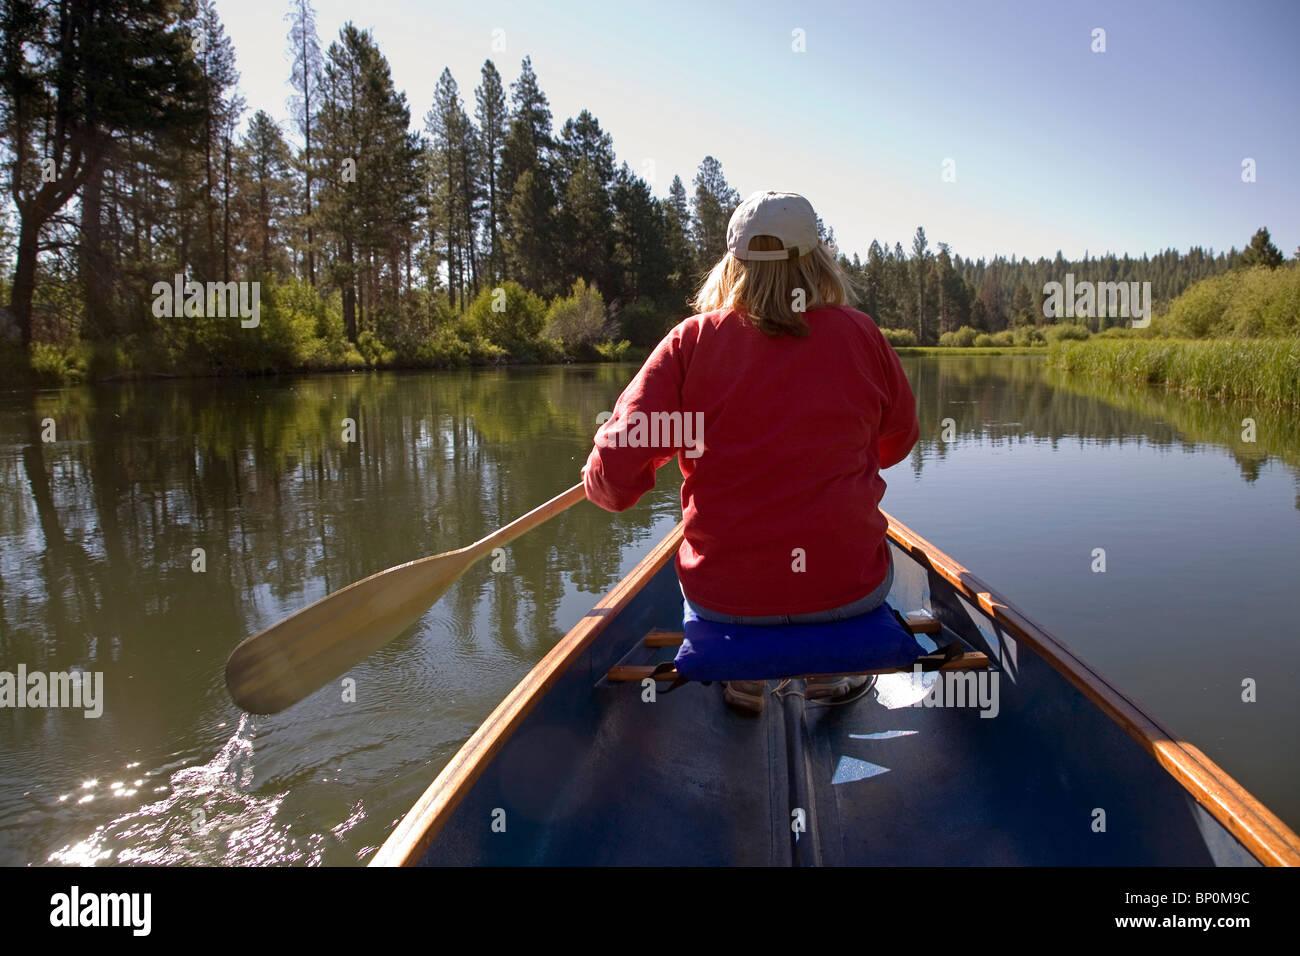 A woman paddling a canoe on the Deschutes River, Oregon - Stock Image